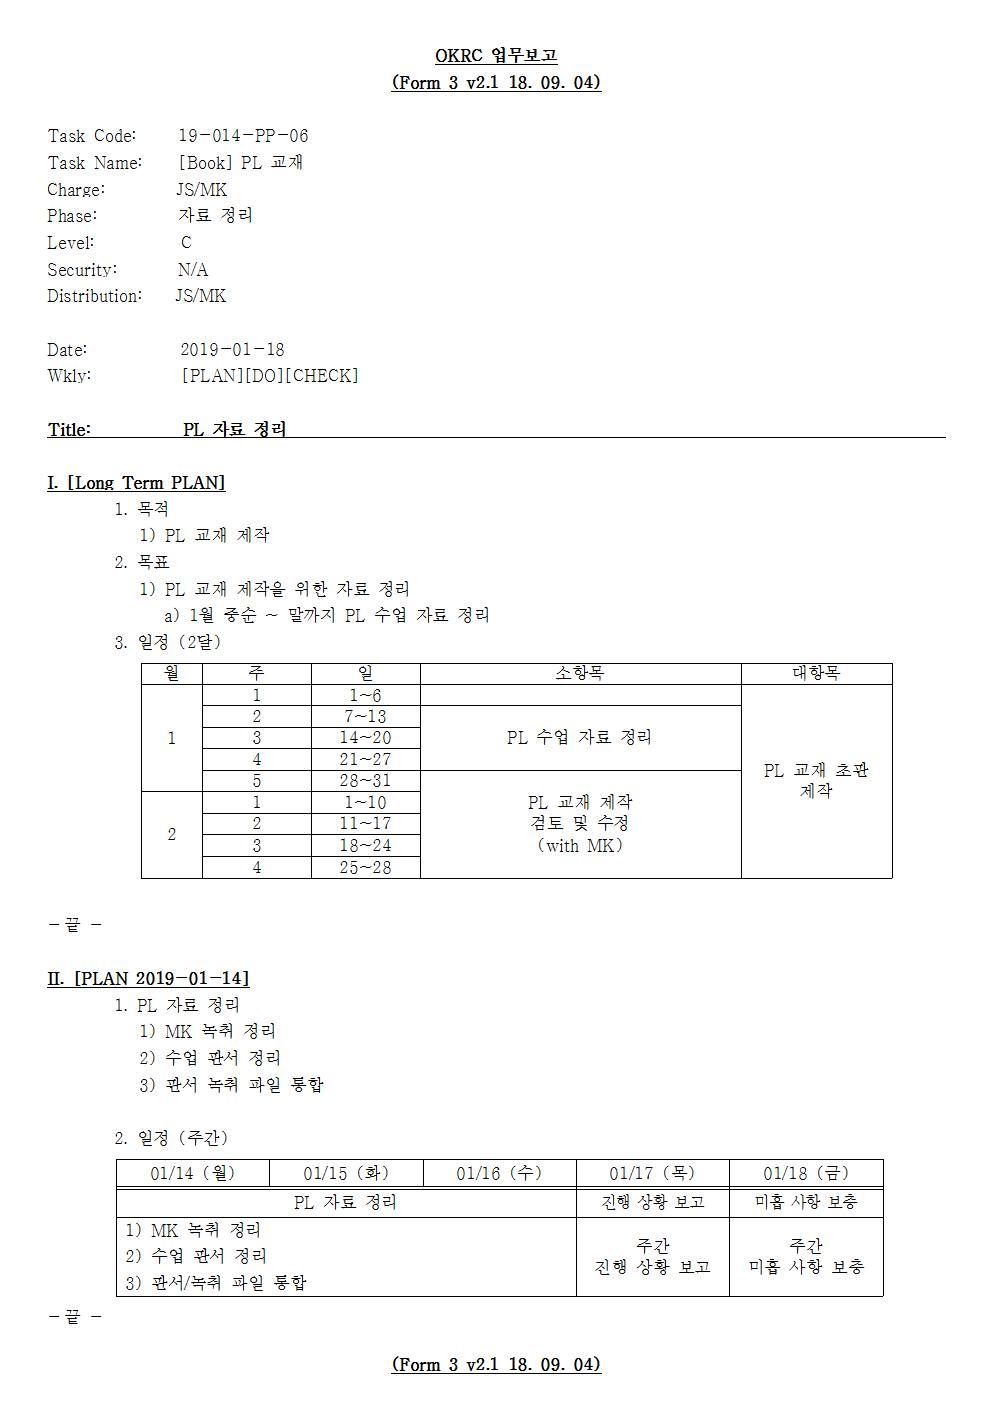 D-[19-014-PP-06]-[Book-PL]-[2019-01-18][JS]001.jpg